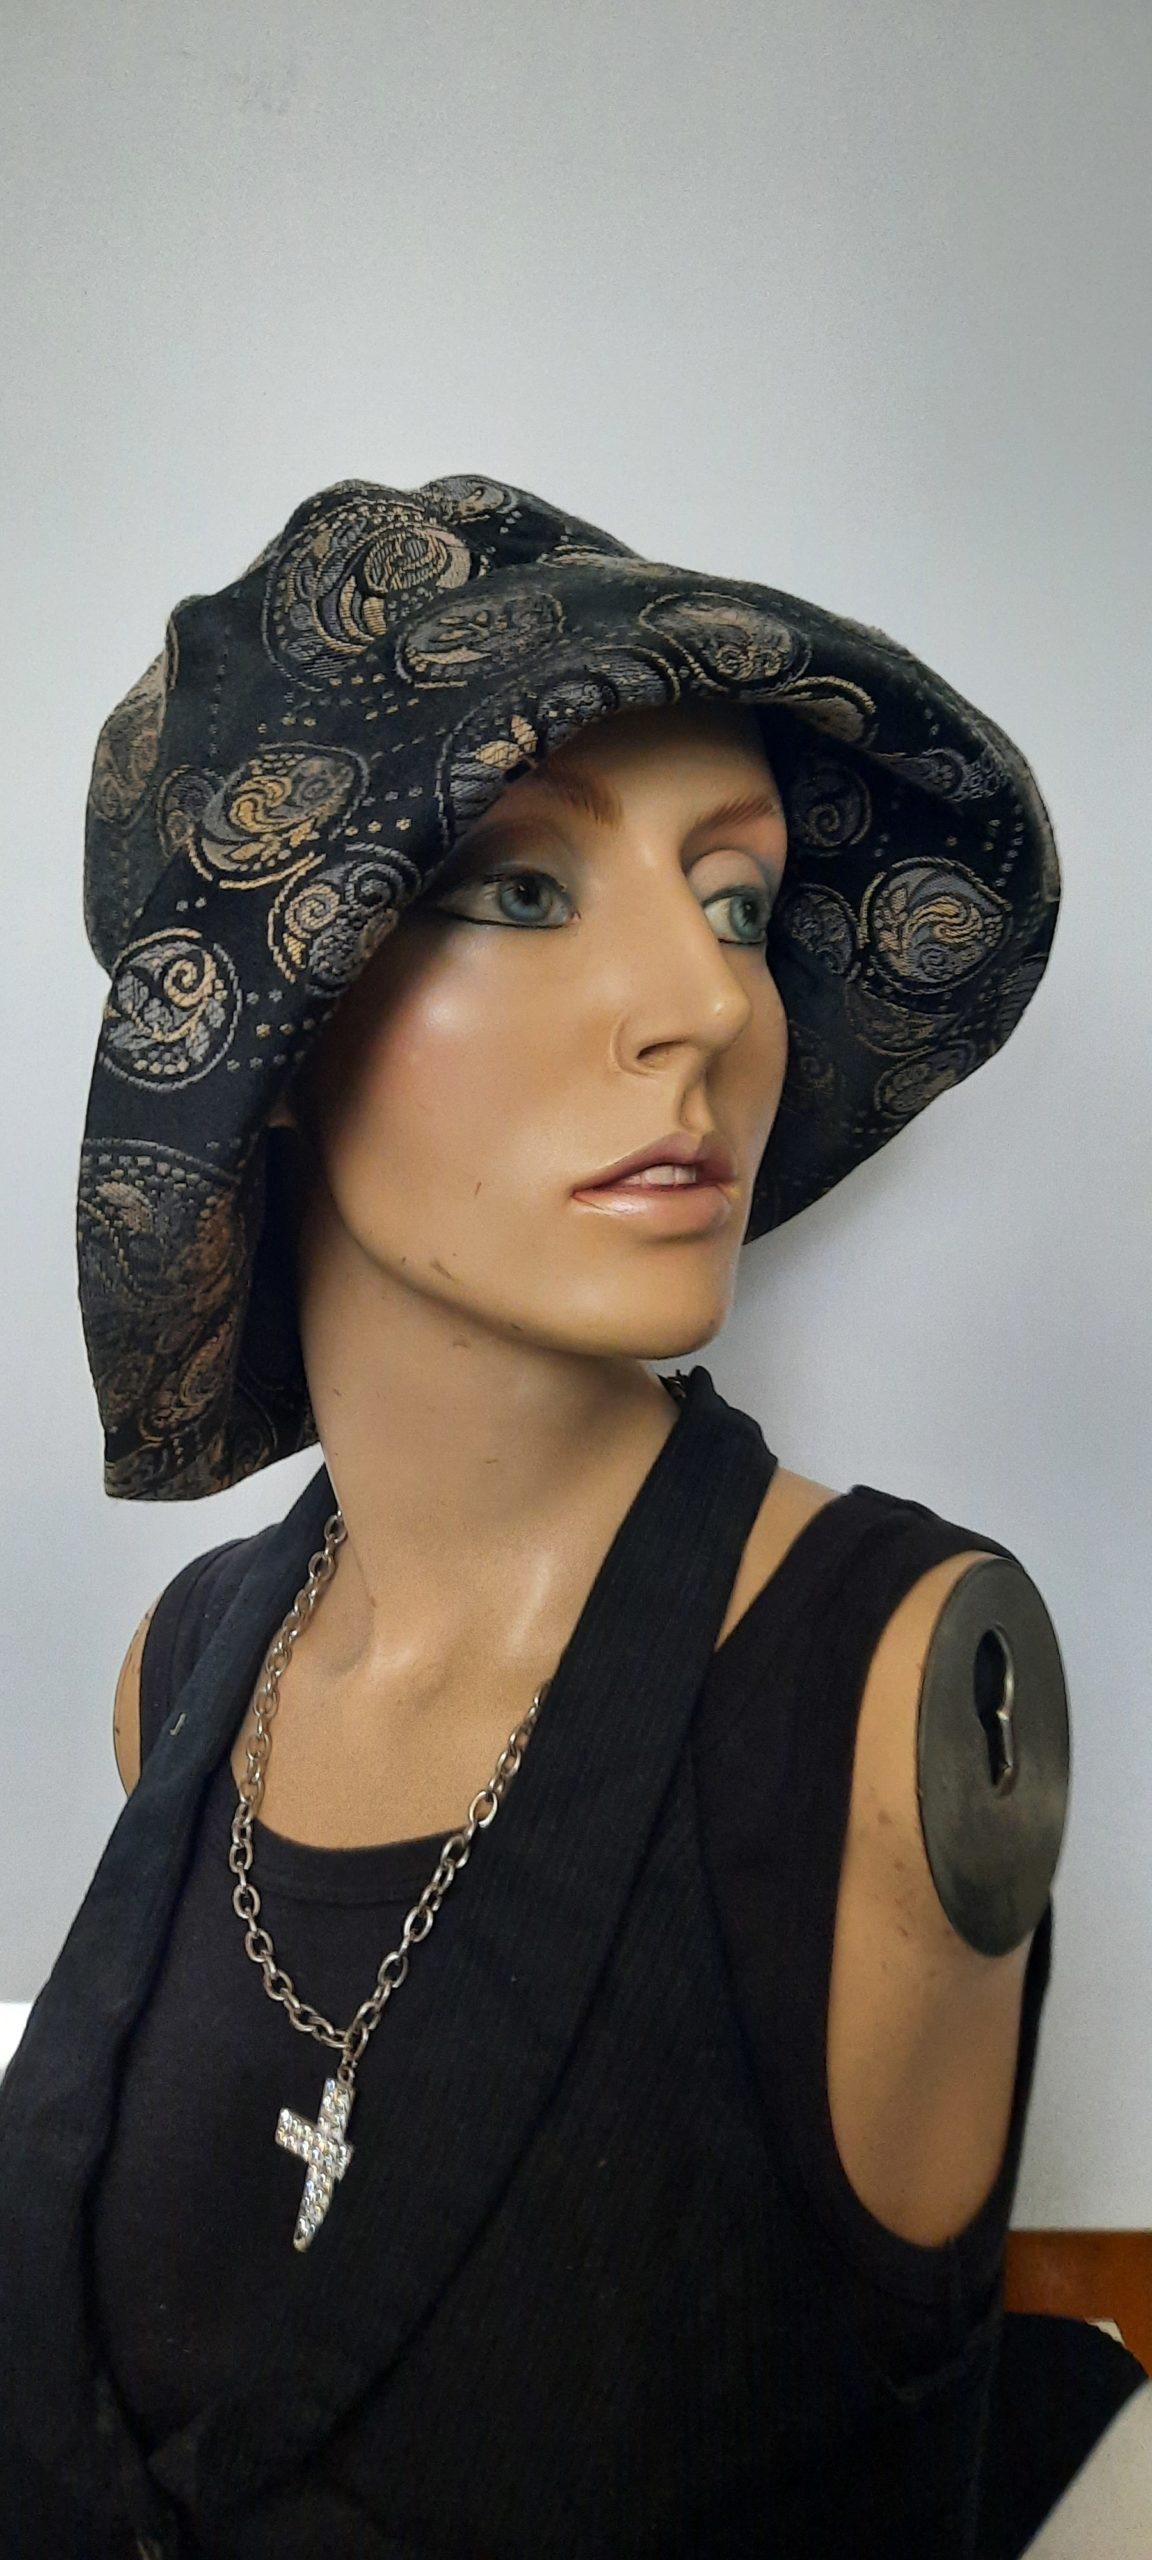 Dunkler Damenhut Rufina - Hutmanufaktur Petra Benz